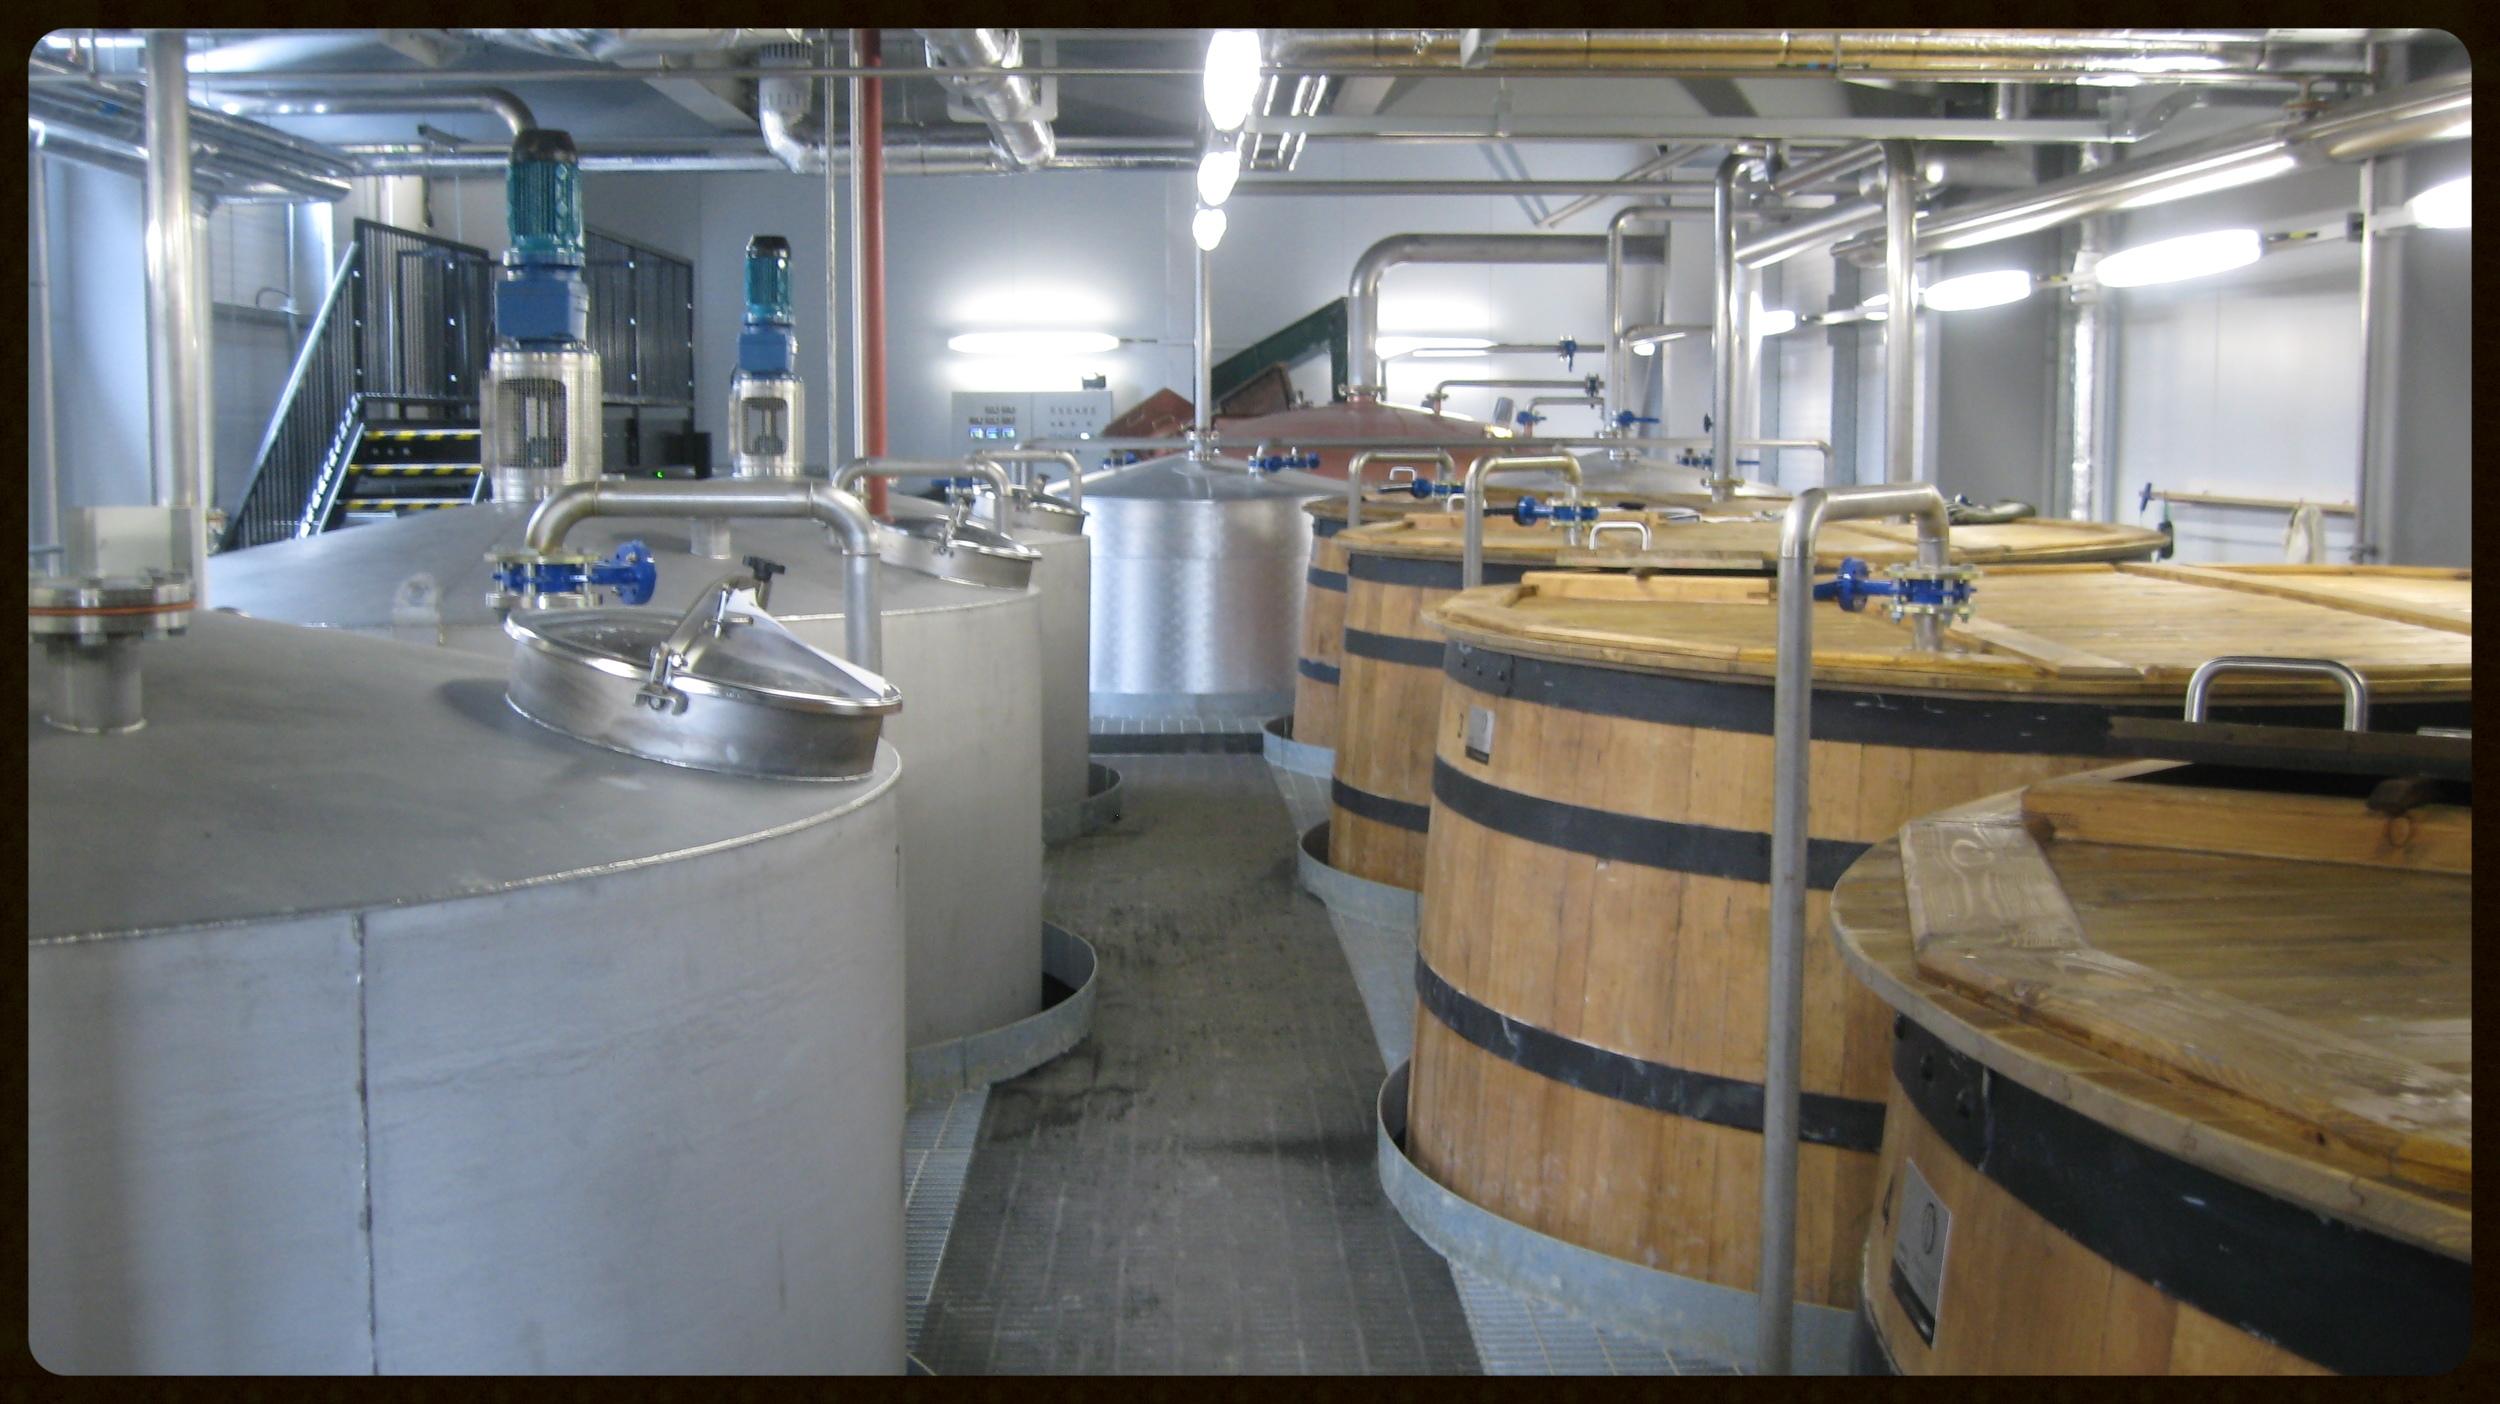 Steel mash tuns and wooden wash backs at Ardnamurchan Distillery, Scotland.